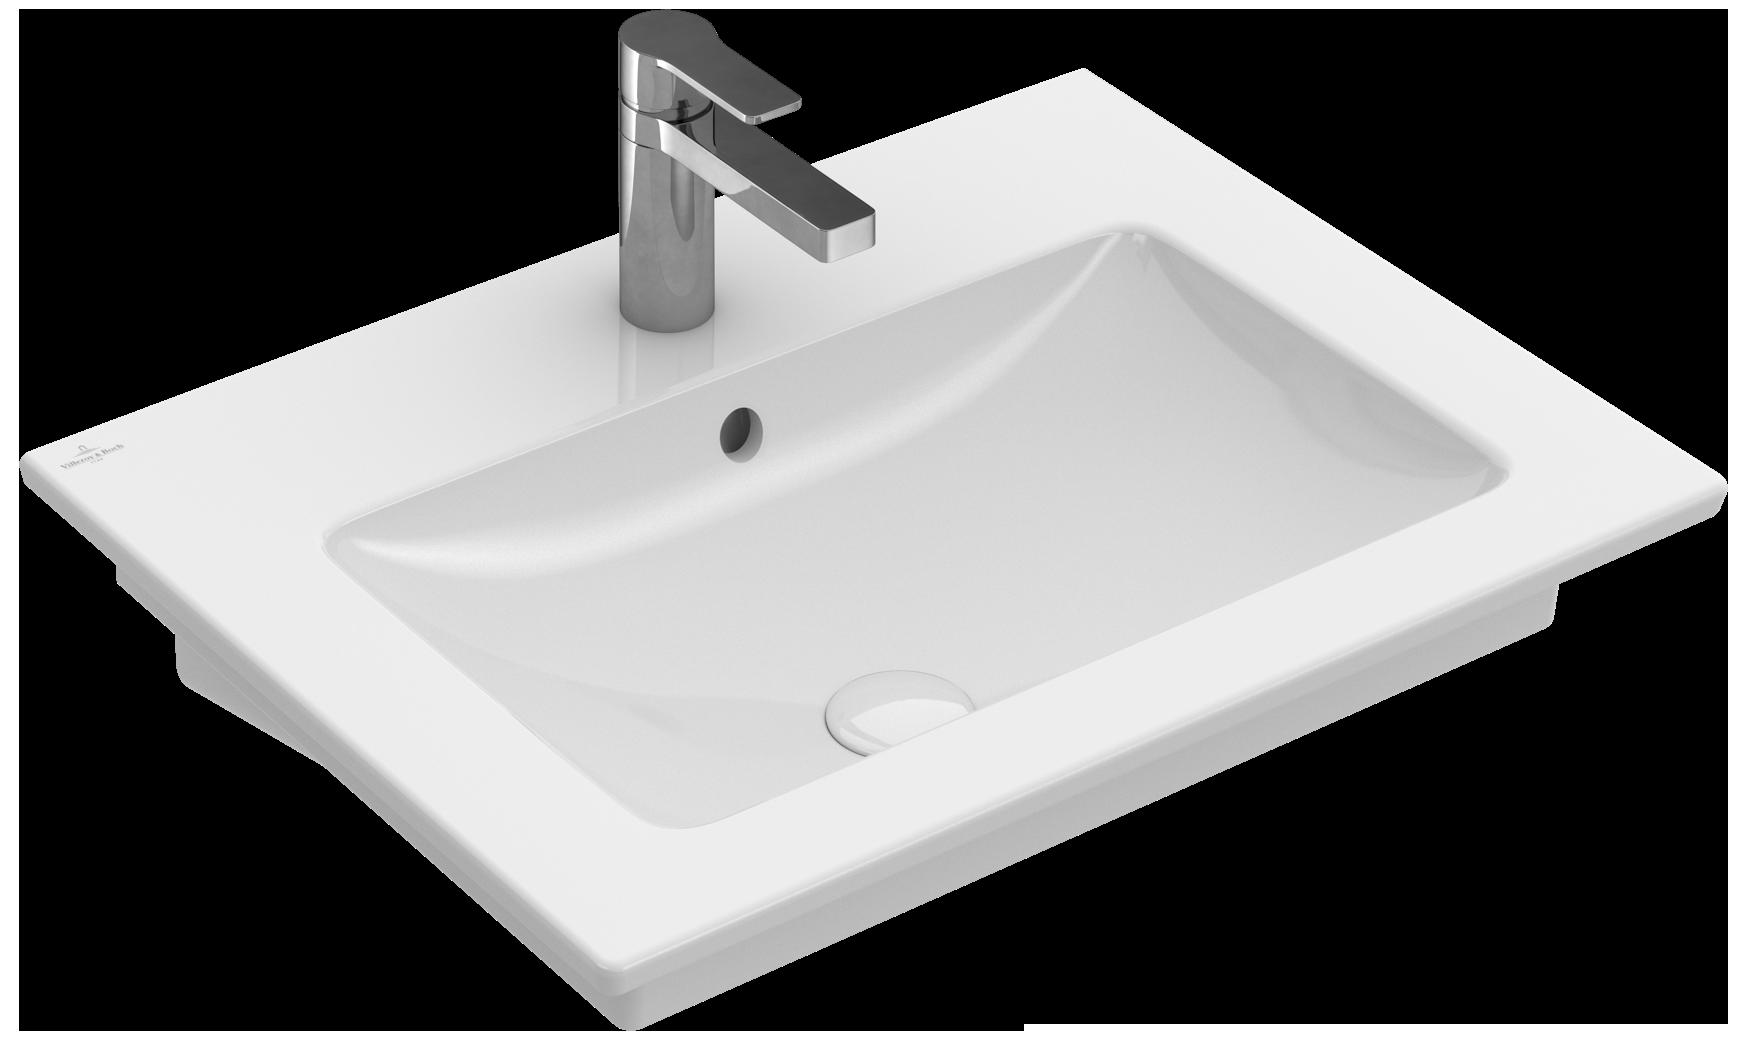 venticello washbasin 24 angular 4124u2 villeroy boch. Black Bedroom Furniture Sets. Home Design Ideas